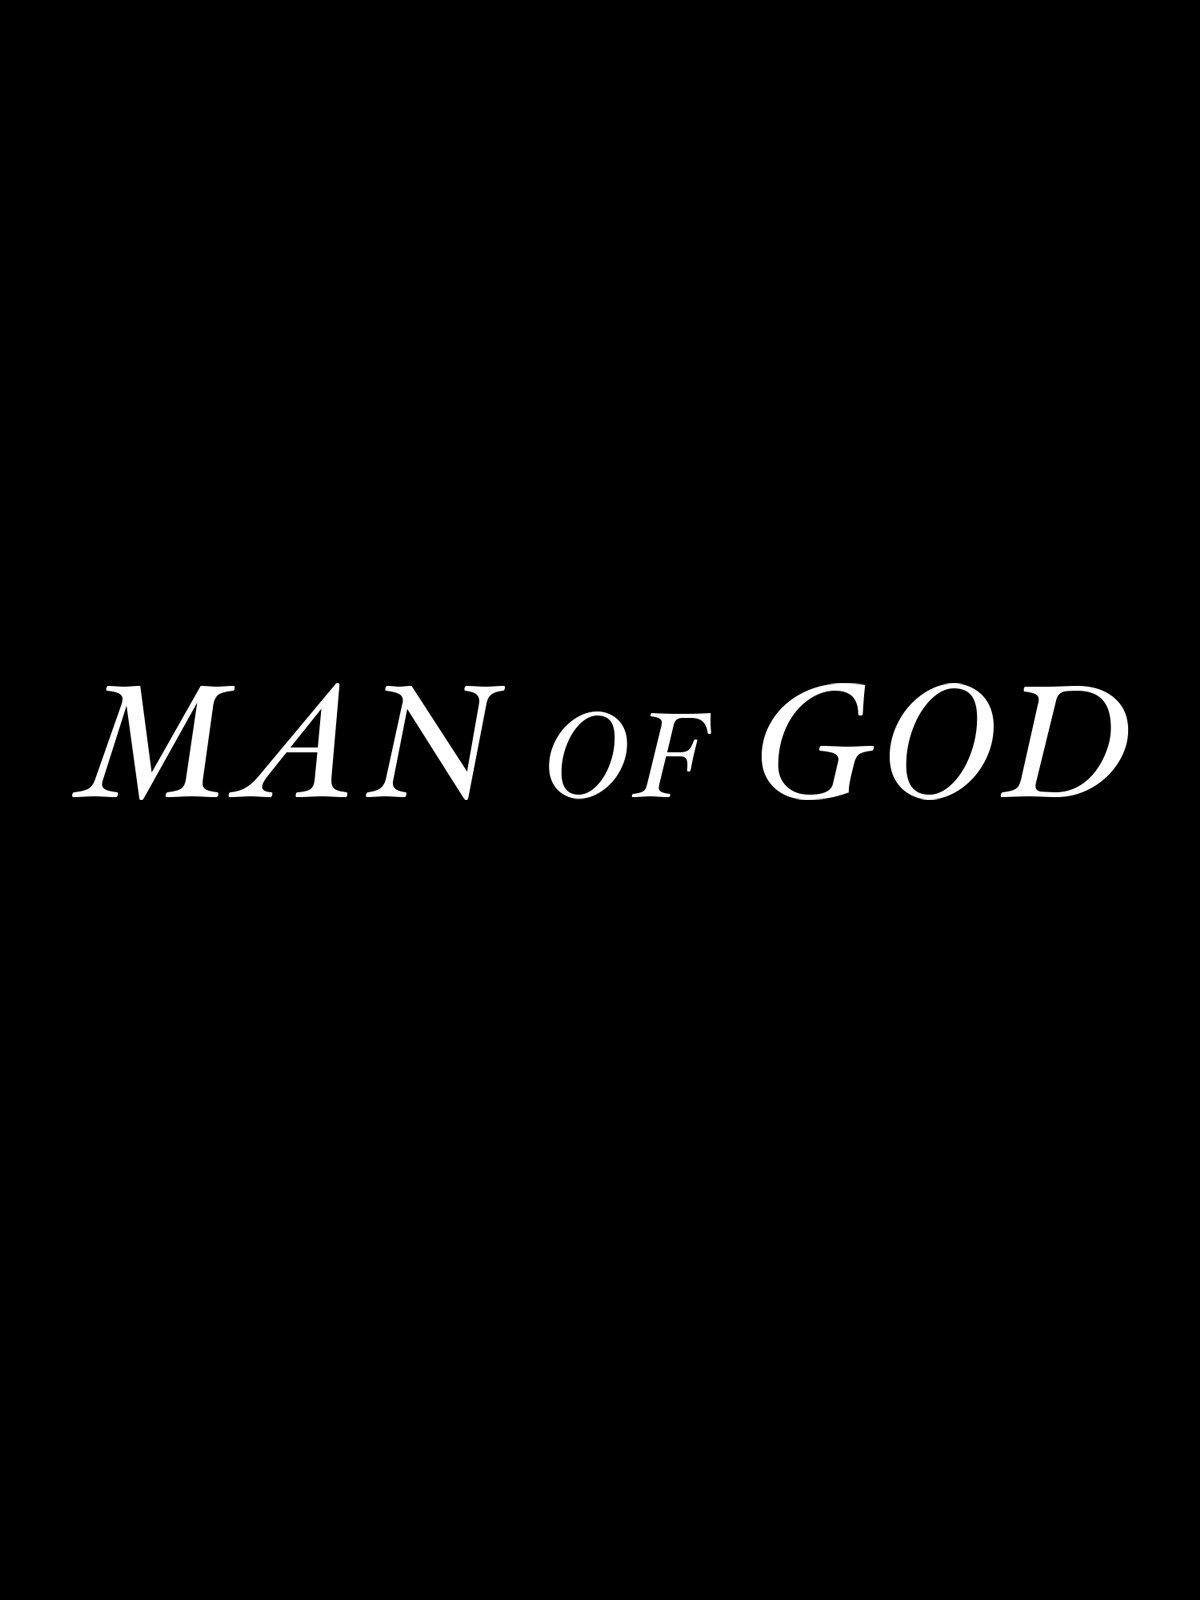 Man of God